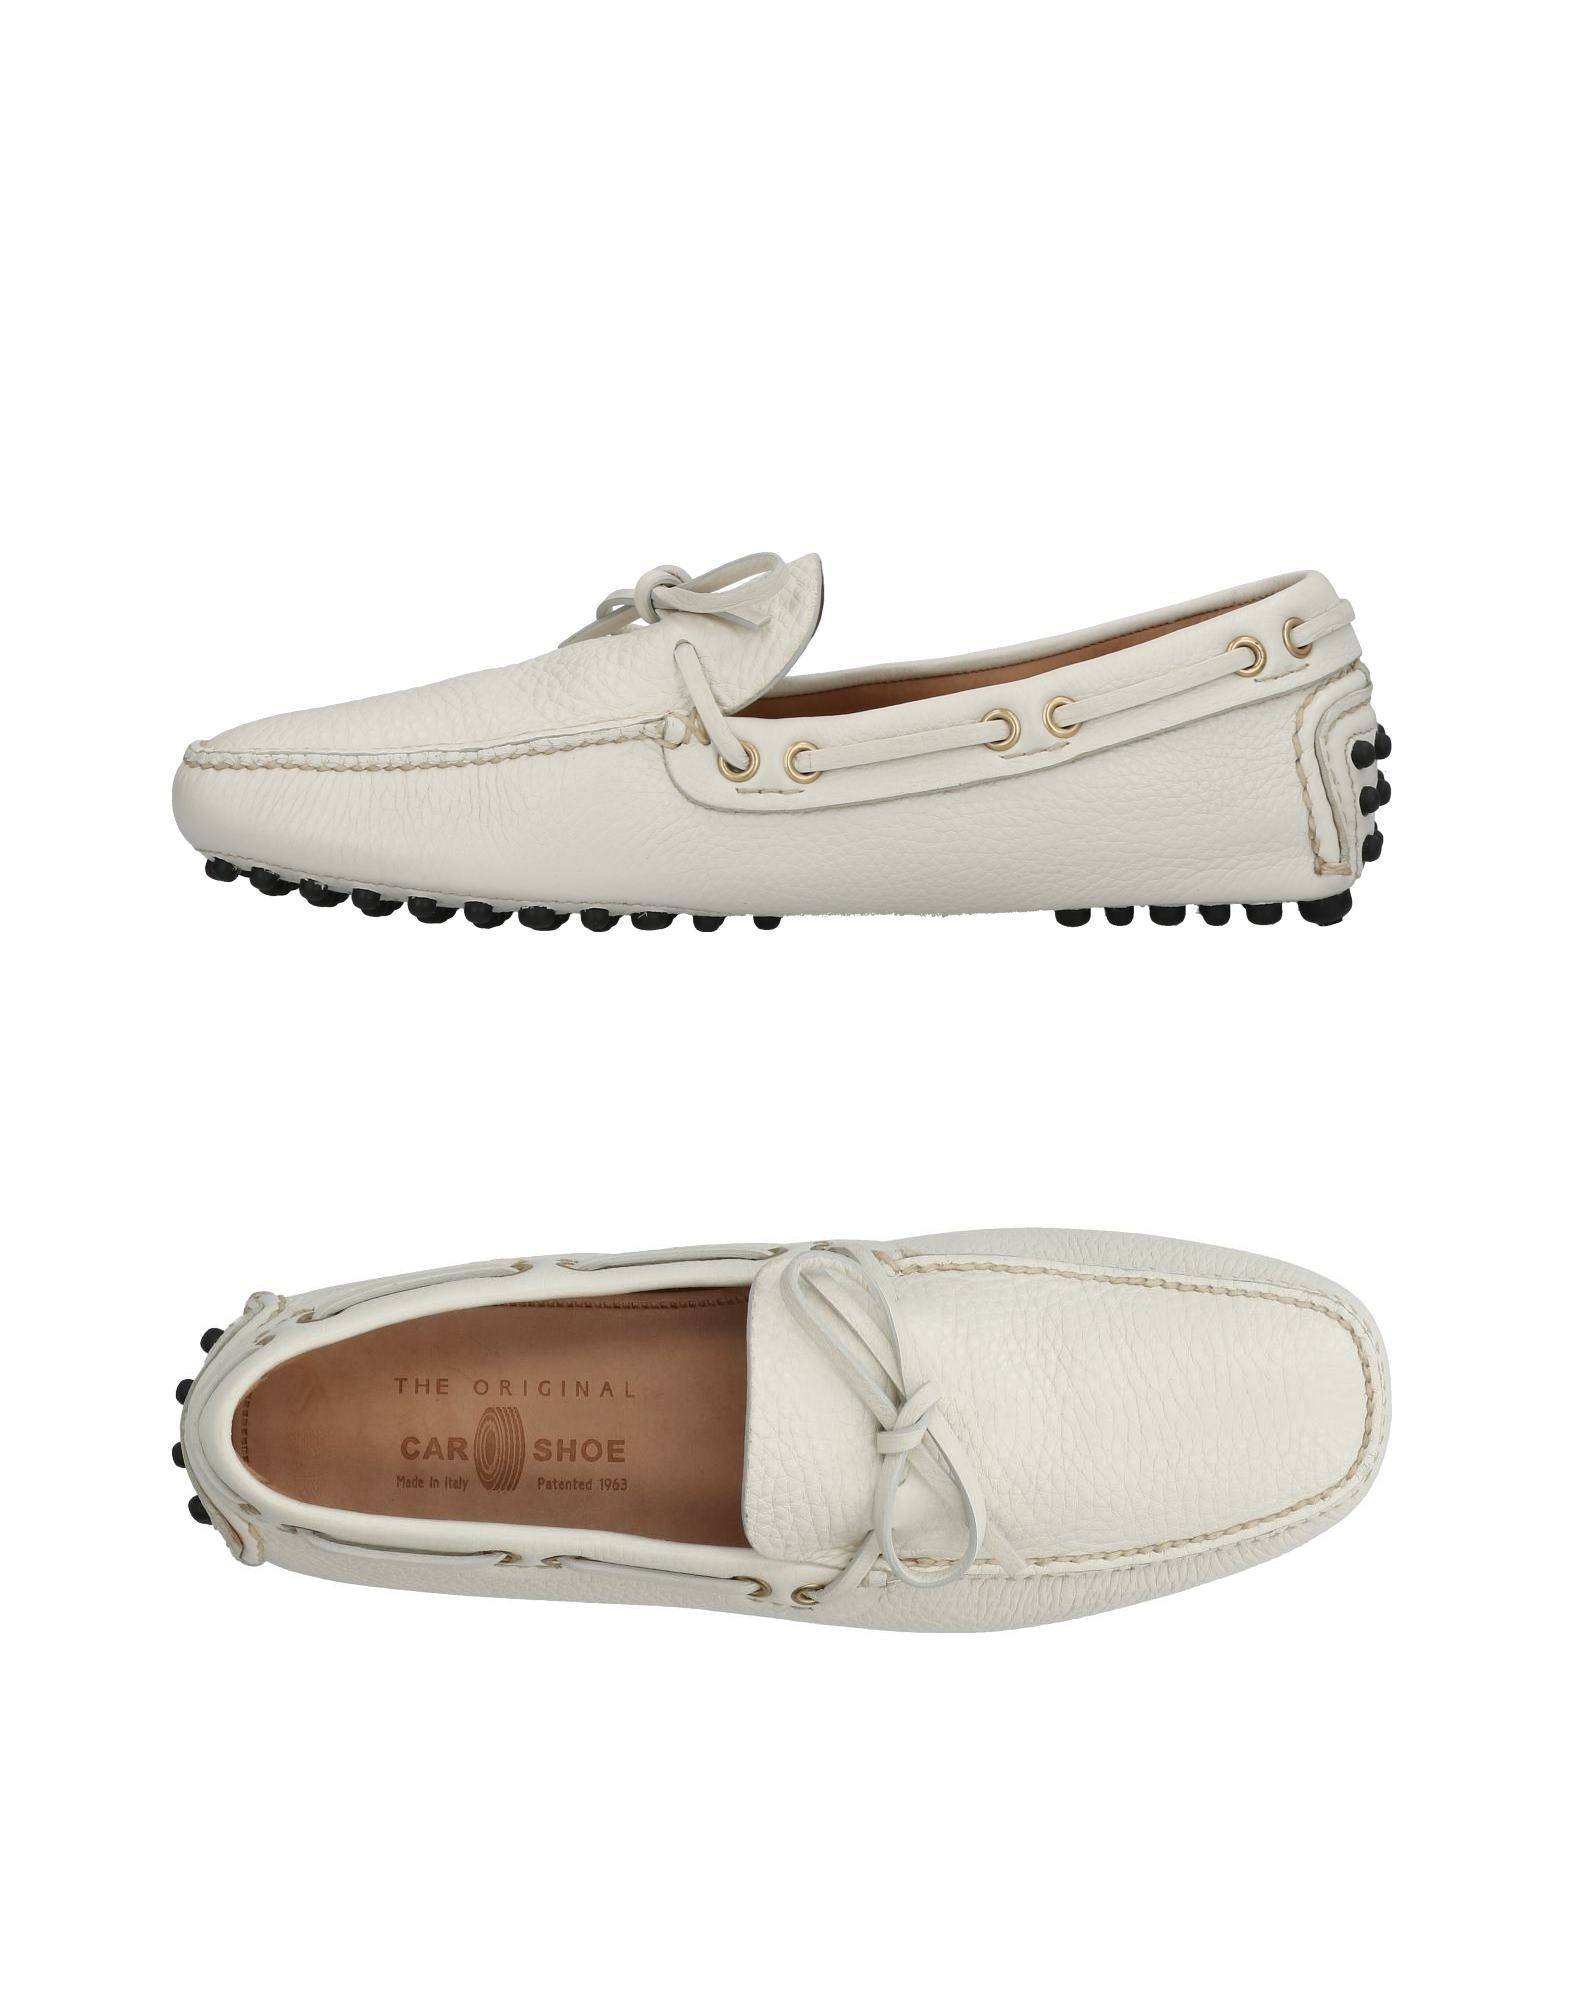 Carshoe 11131644NX Mokassins Herren  11131644NX Carshoe Heiße Schuhe 114186